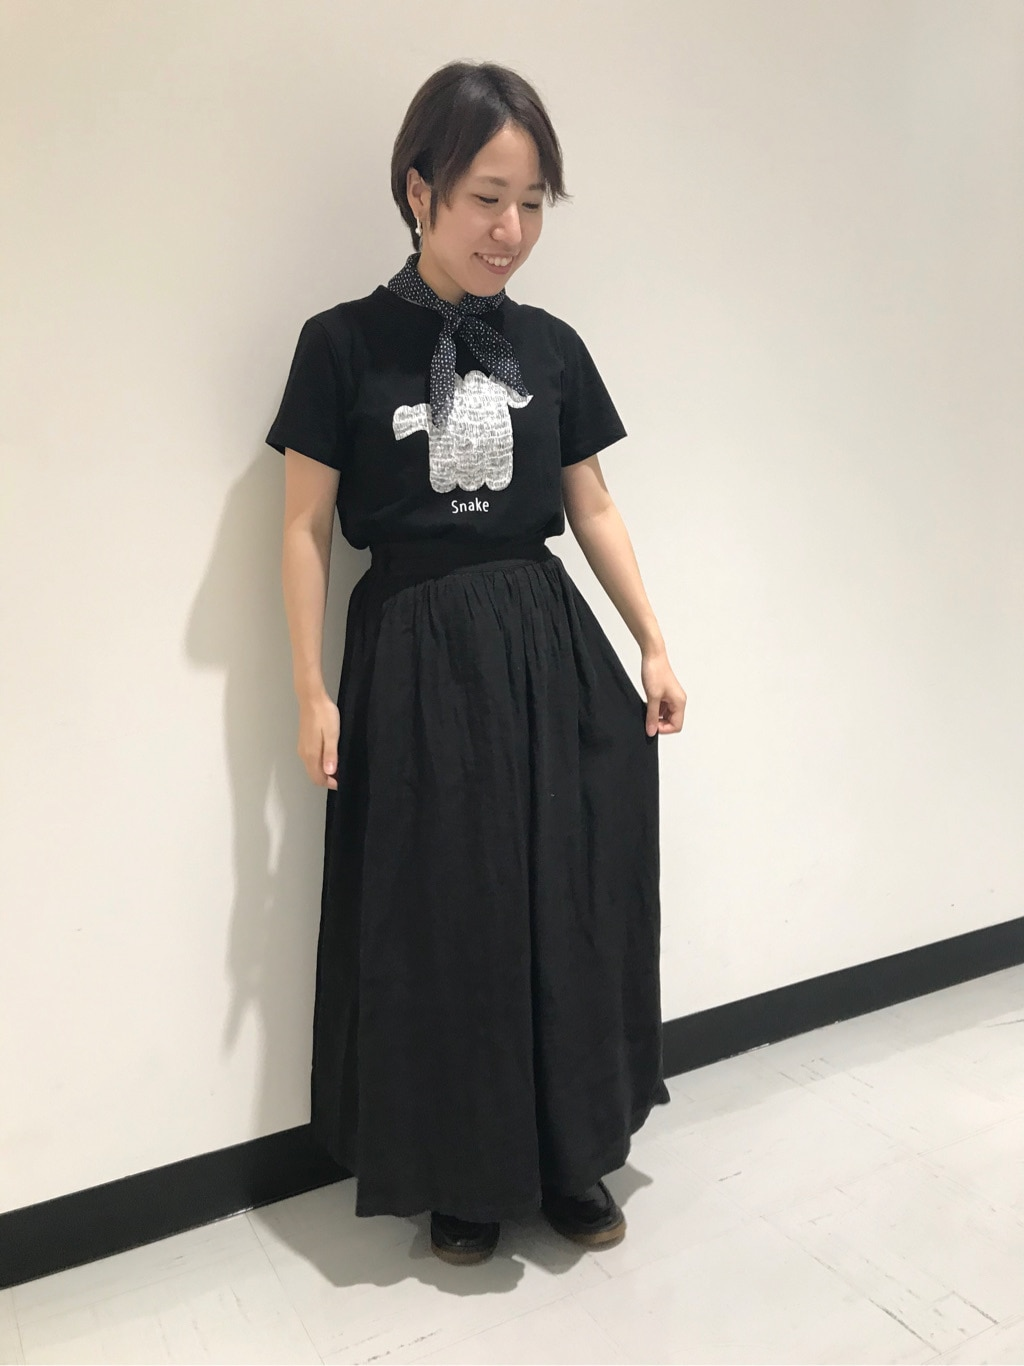 bulle de savon なんばシティ 身長:148cm 2020.07.15